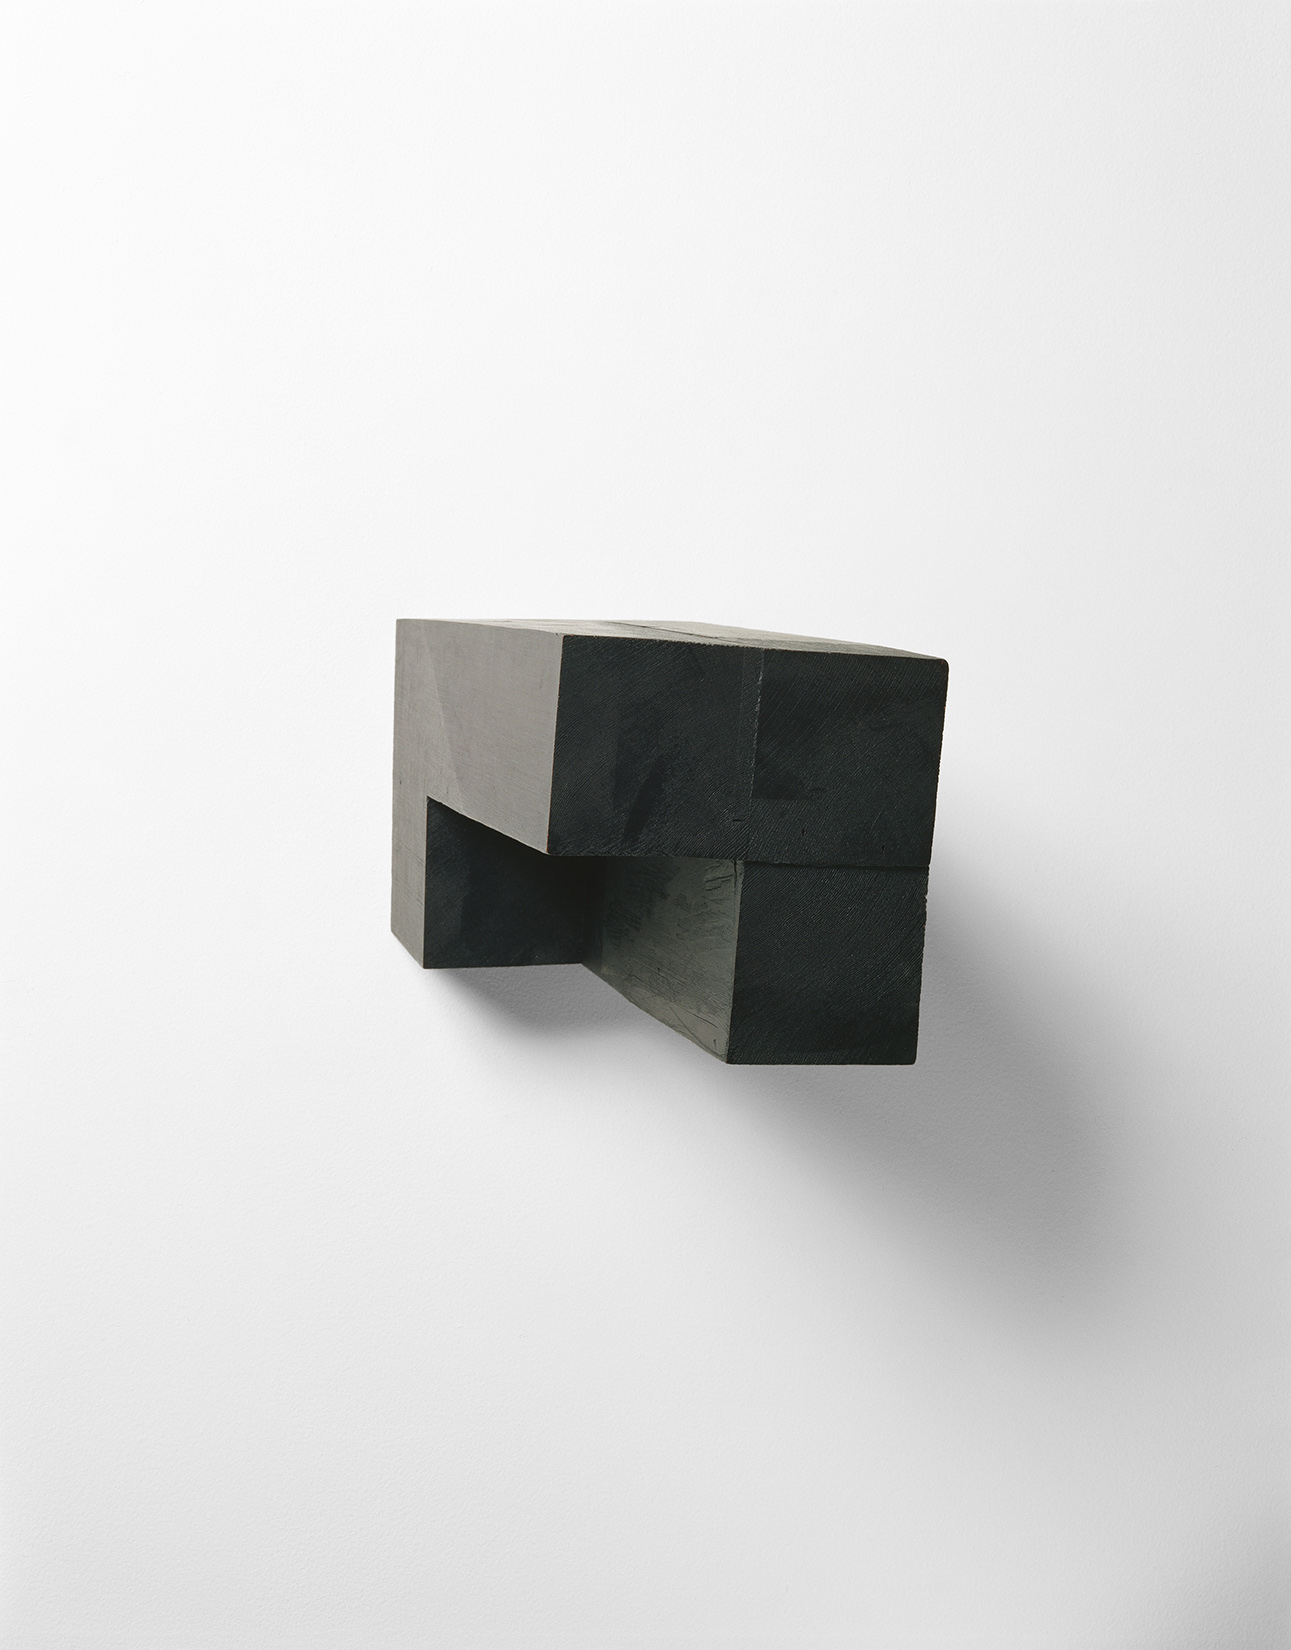 Demeure IX    (1990)   Bois polychrome, 17 x 16.5 x 28 cm, collection privée. photo : Richard-Max Tremblay